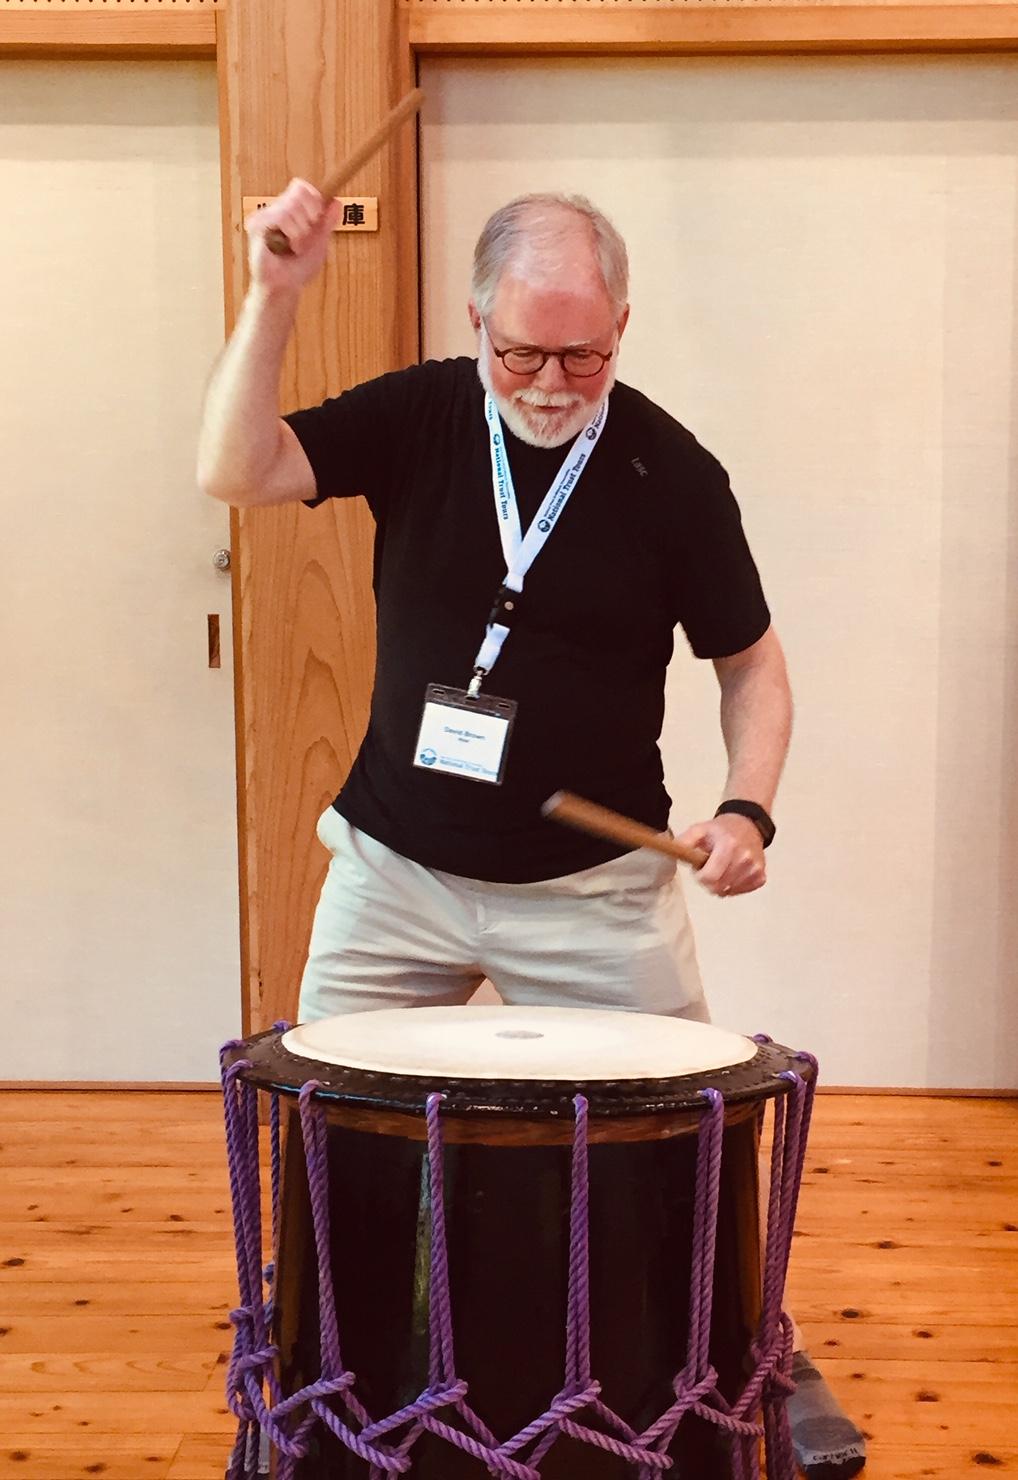 DJB drumming